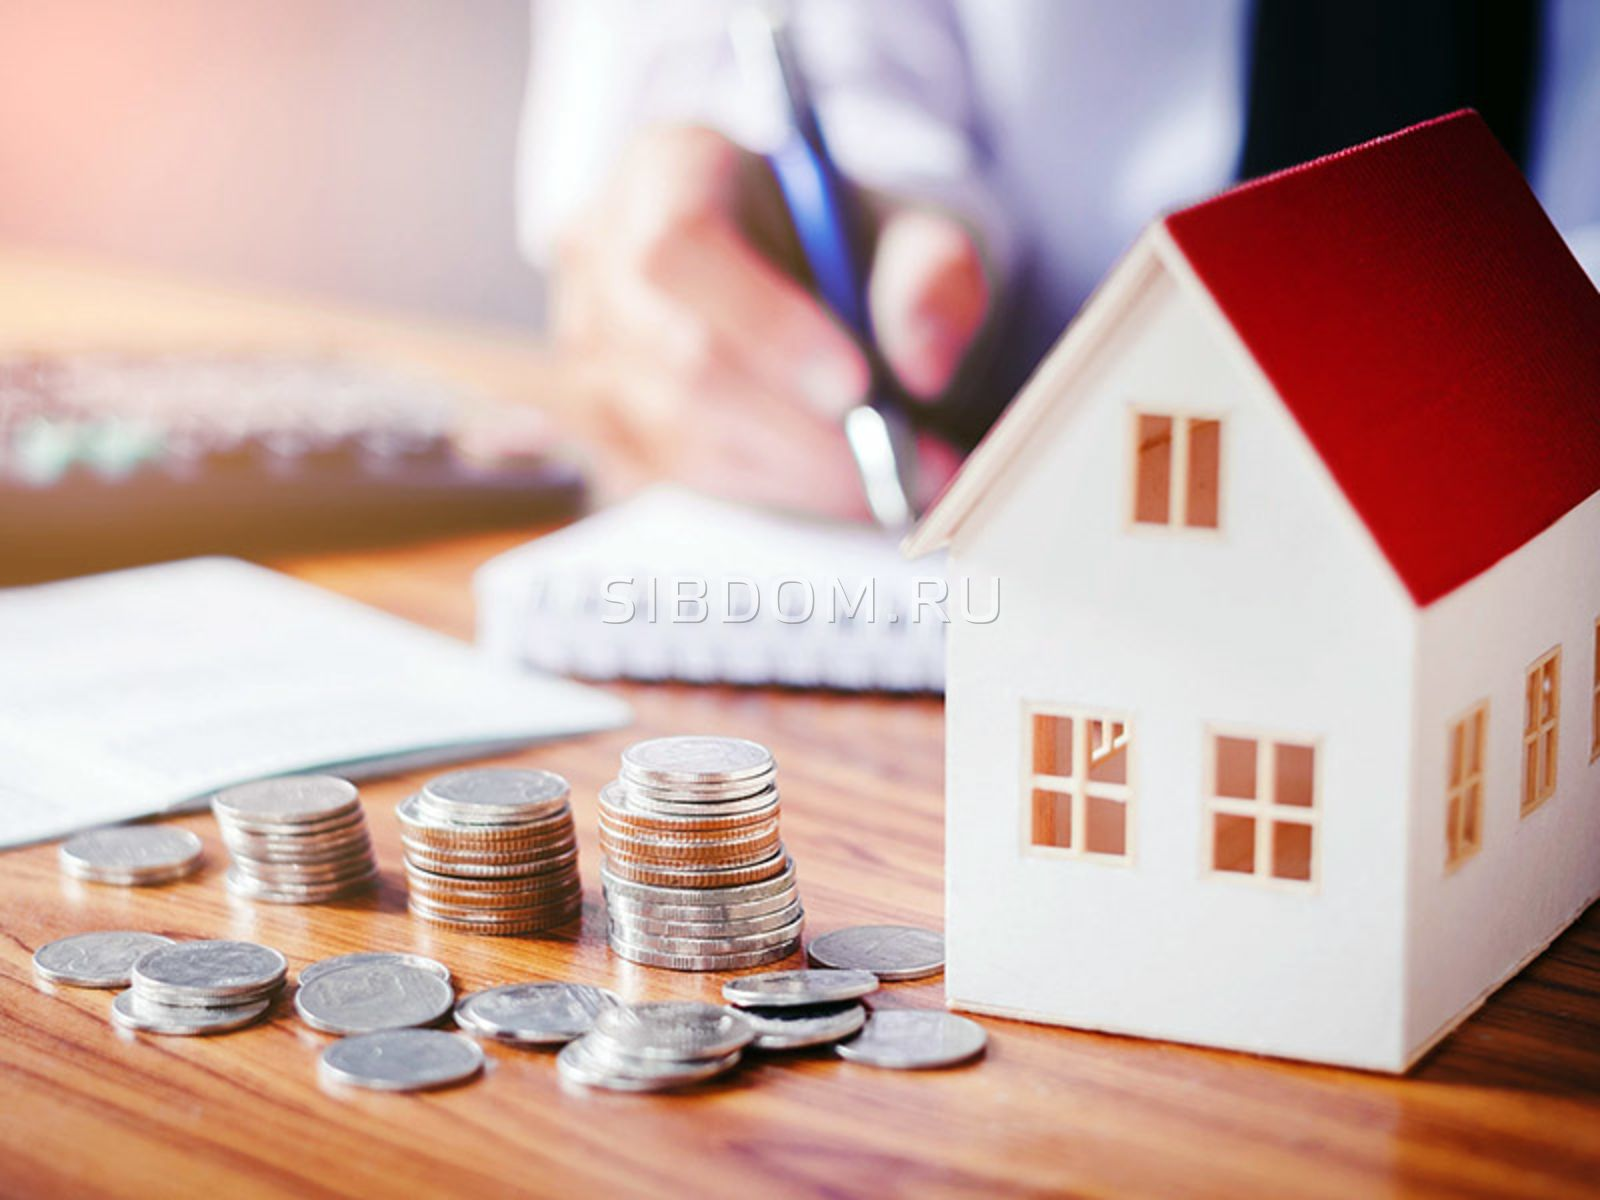 Аижк реструктуризация ипотеки 2020 с помощью государства